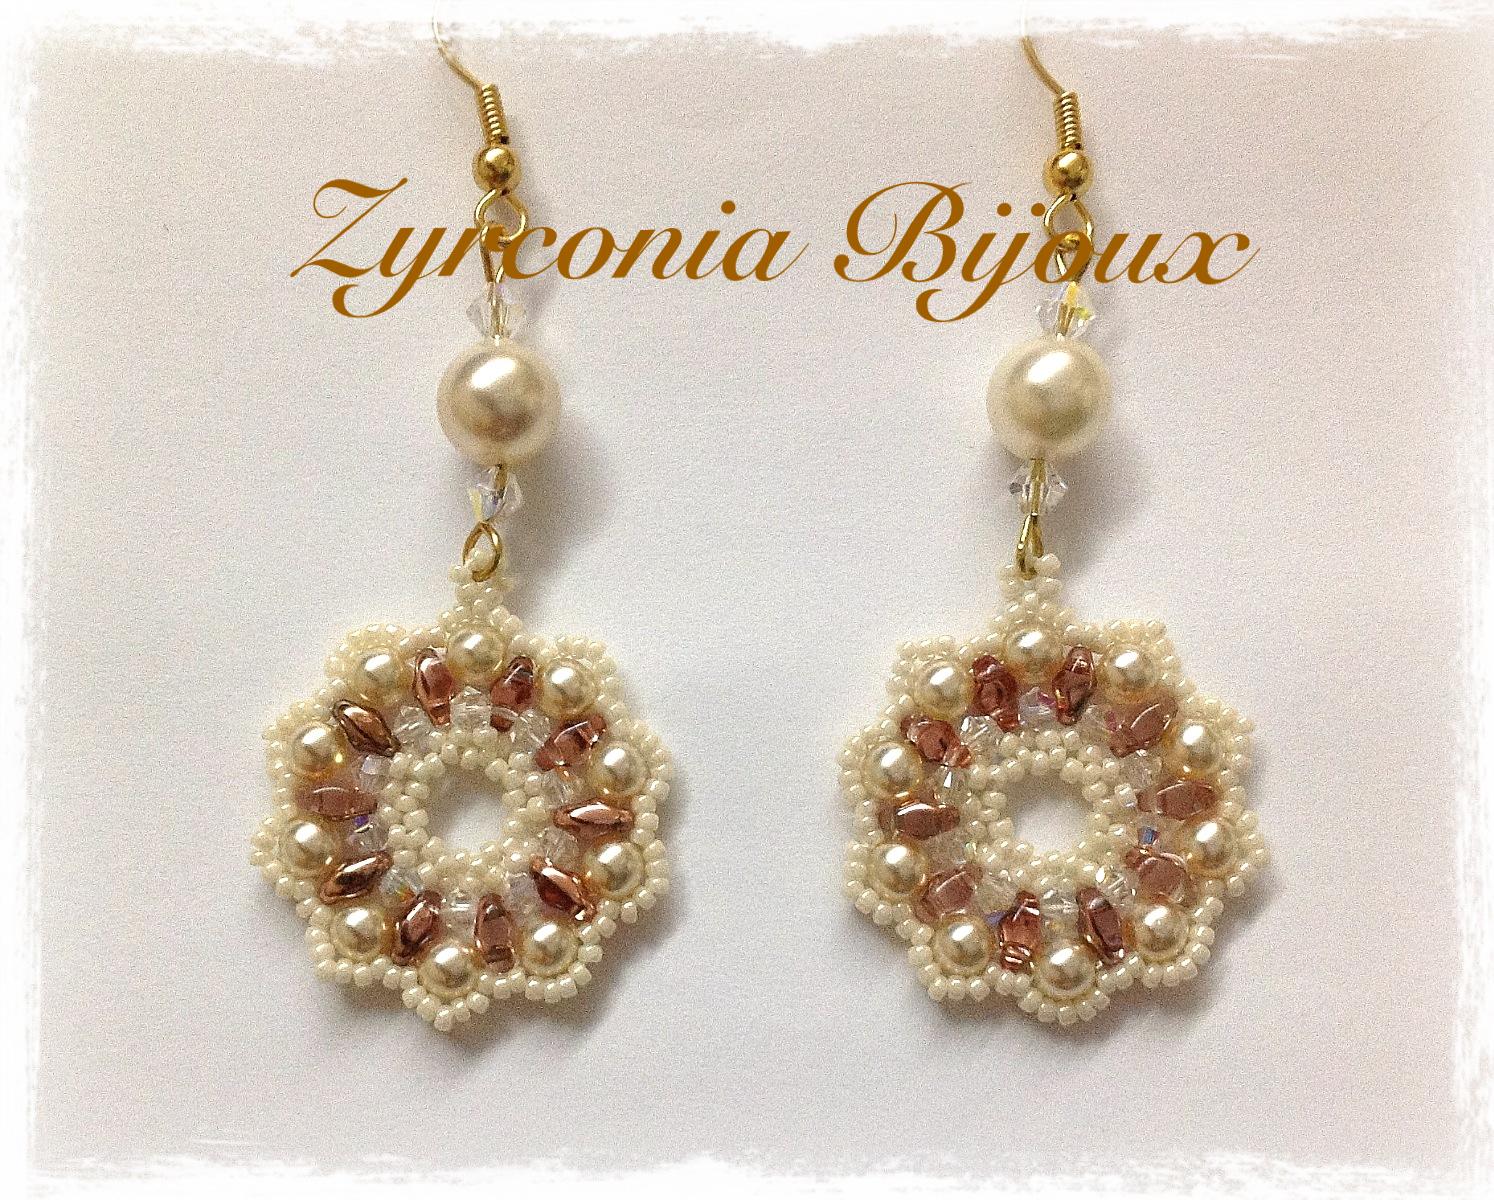 Amato Zyrconia Bijoux: Patterns Beads: Schemi perline: Tutorial  JE72